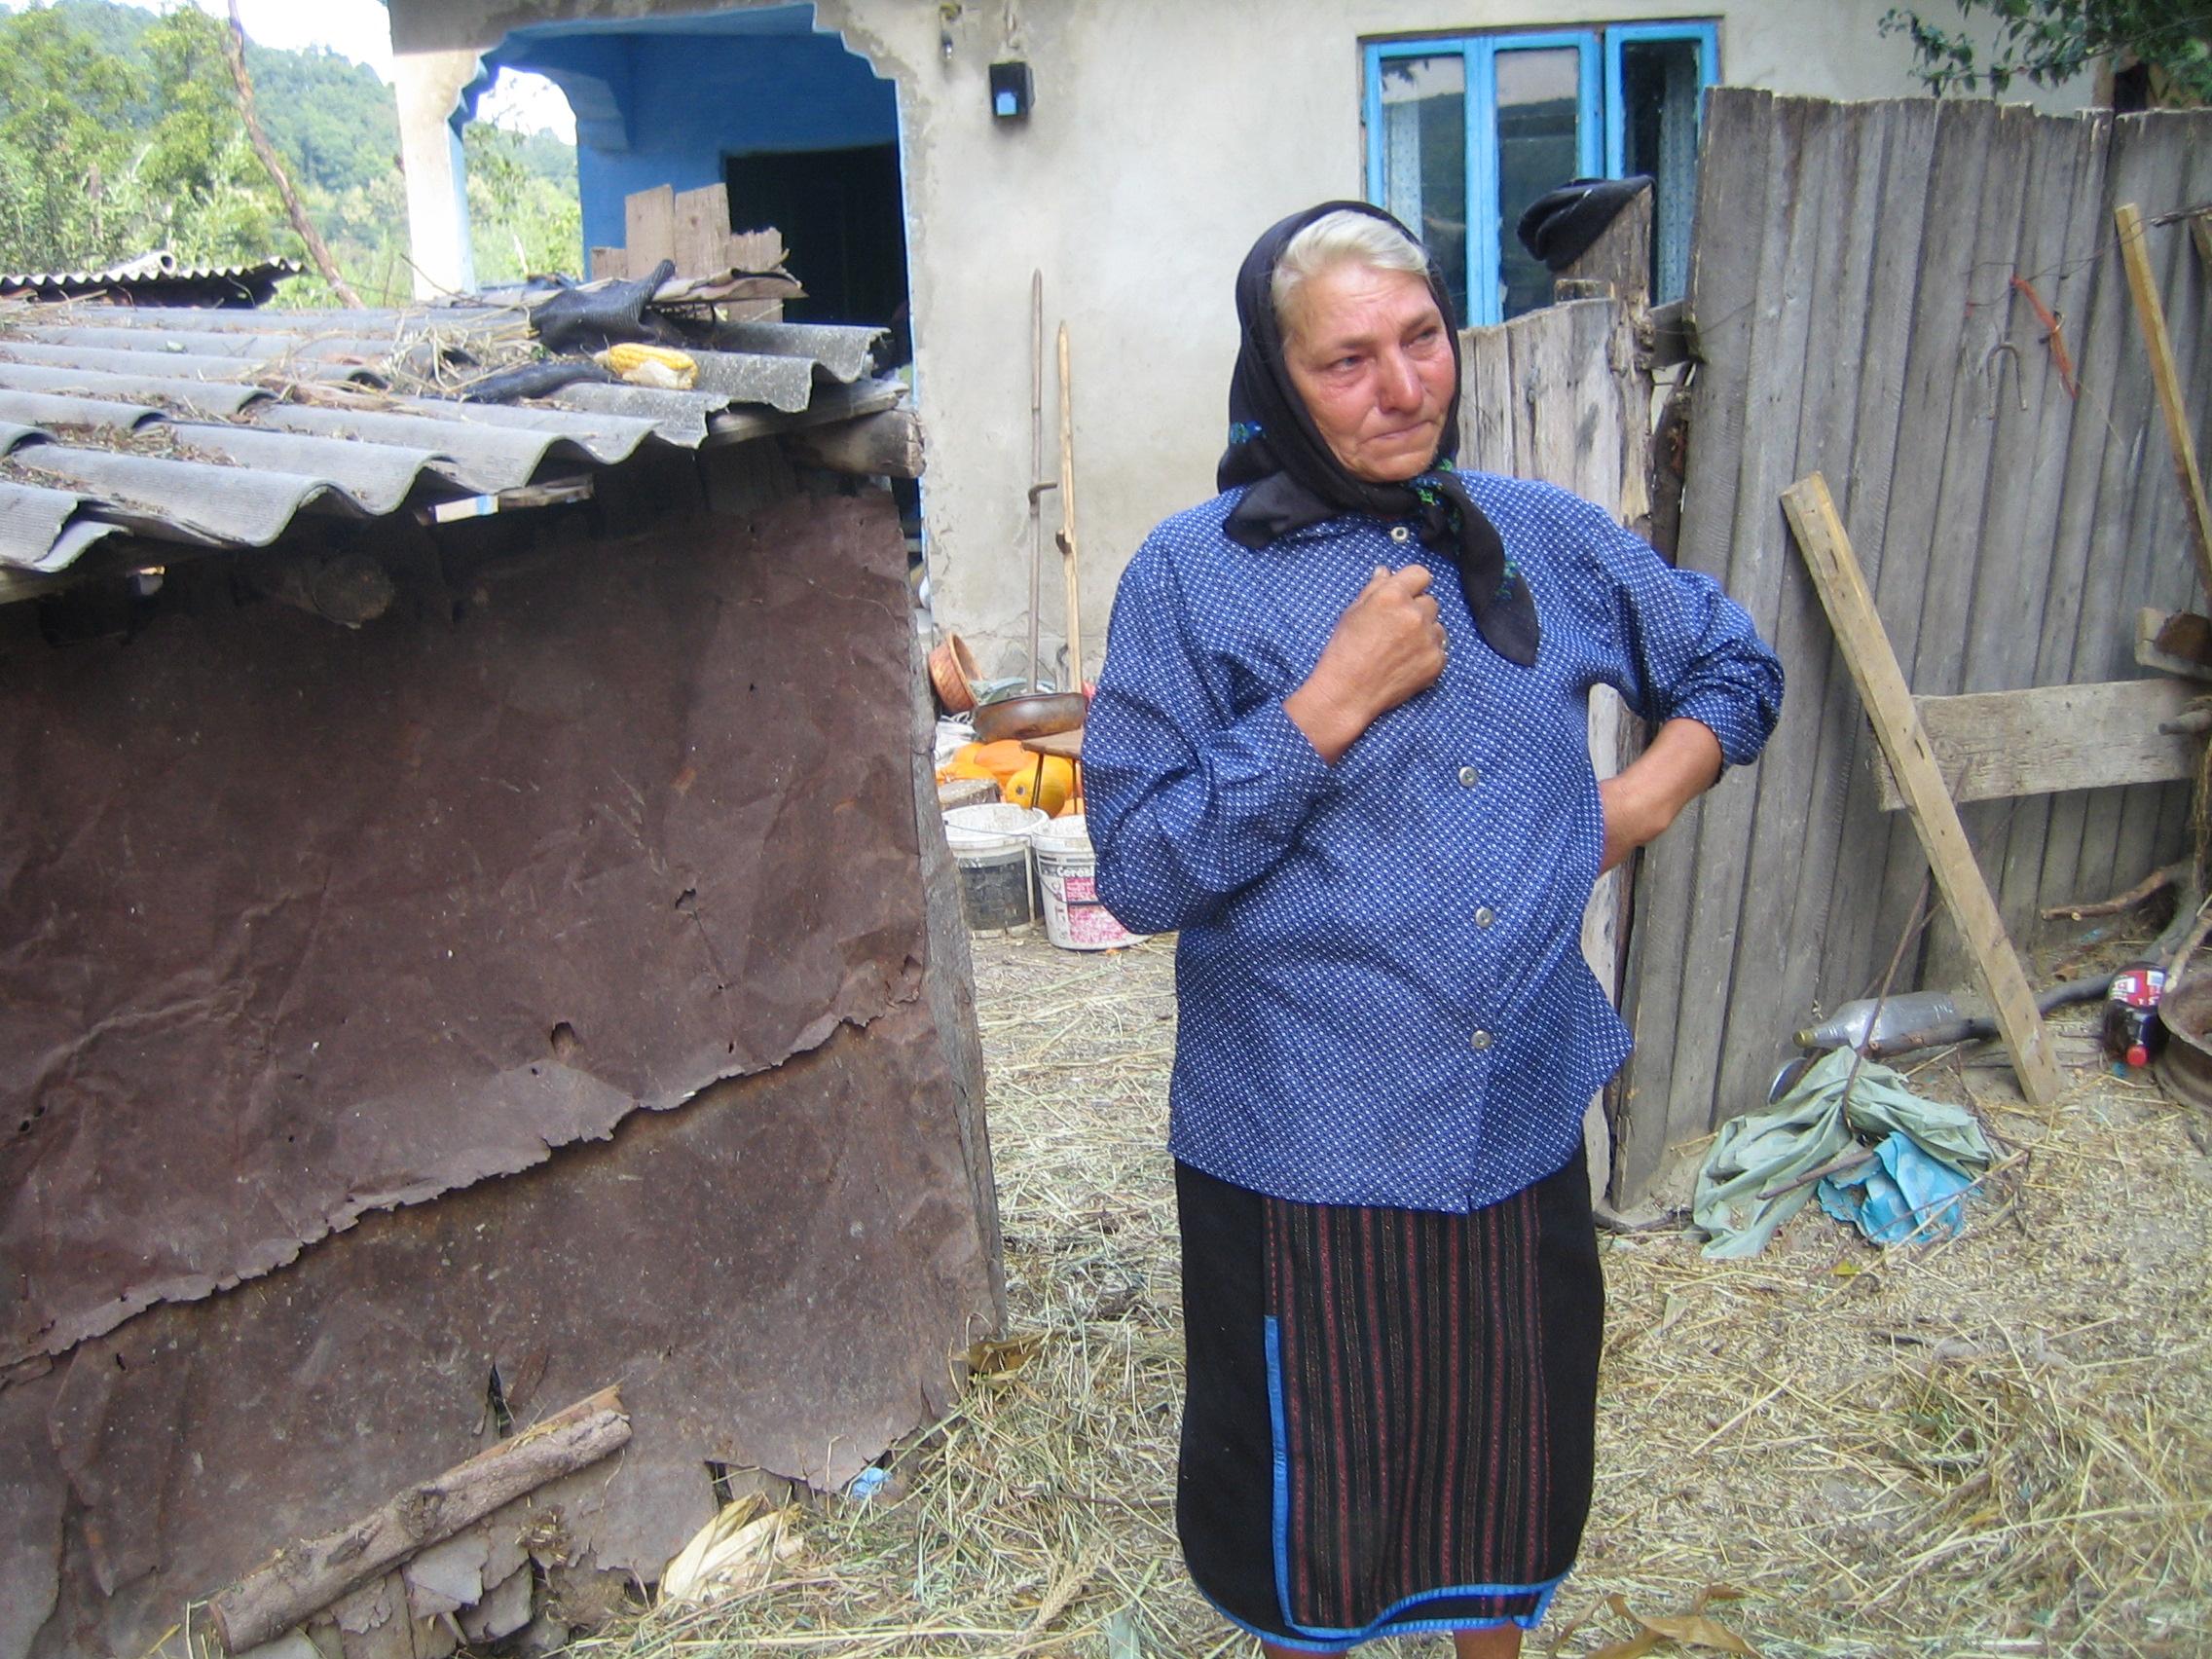 Sora Veronicai Bulai, Maria, locuieste in satul Fundu Racaciuni, Bacau